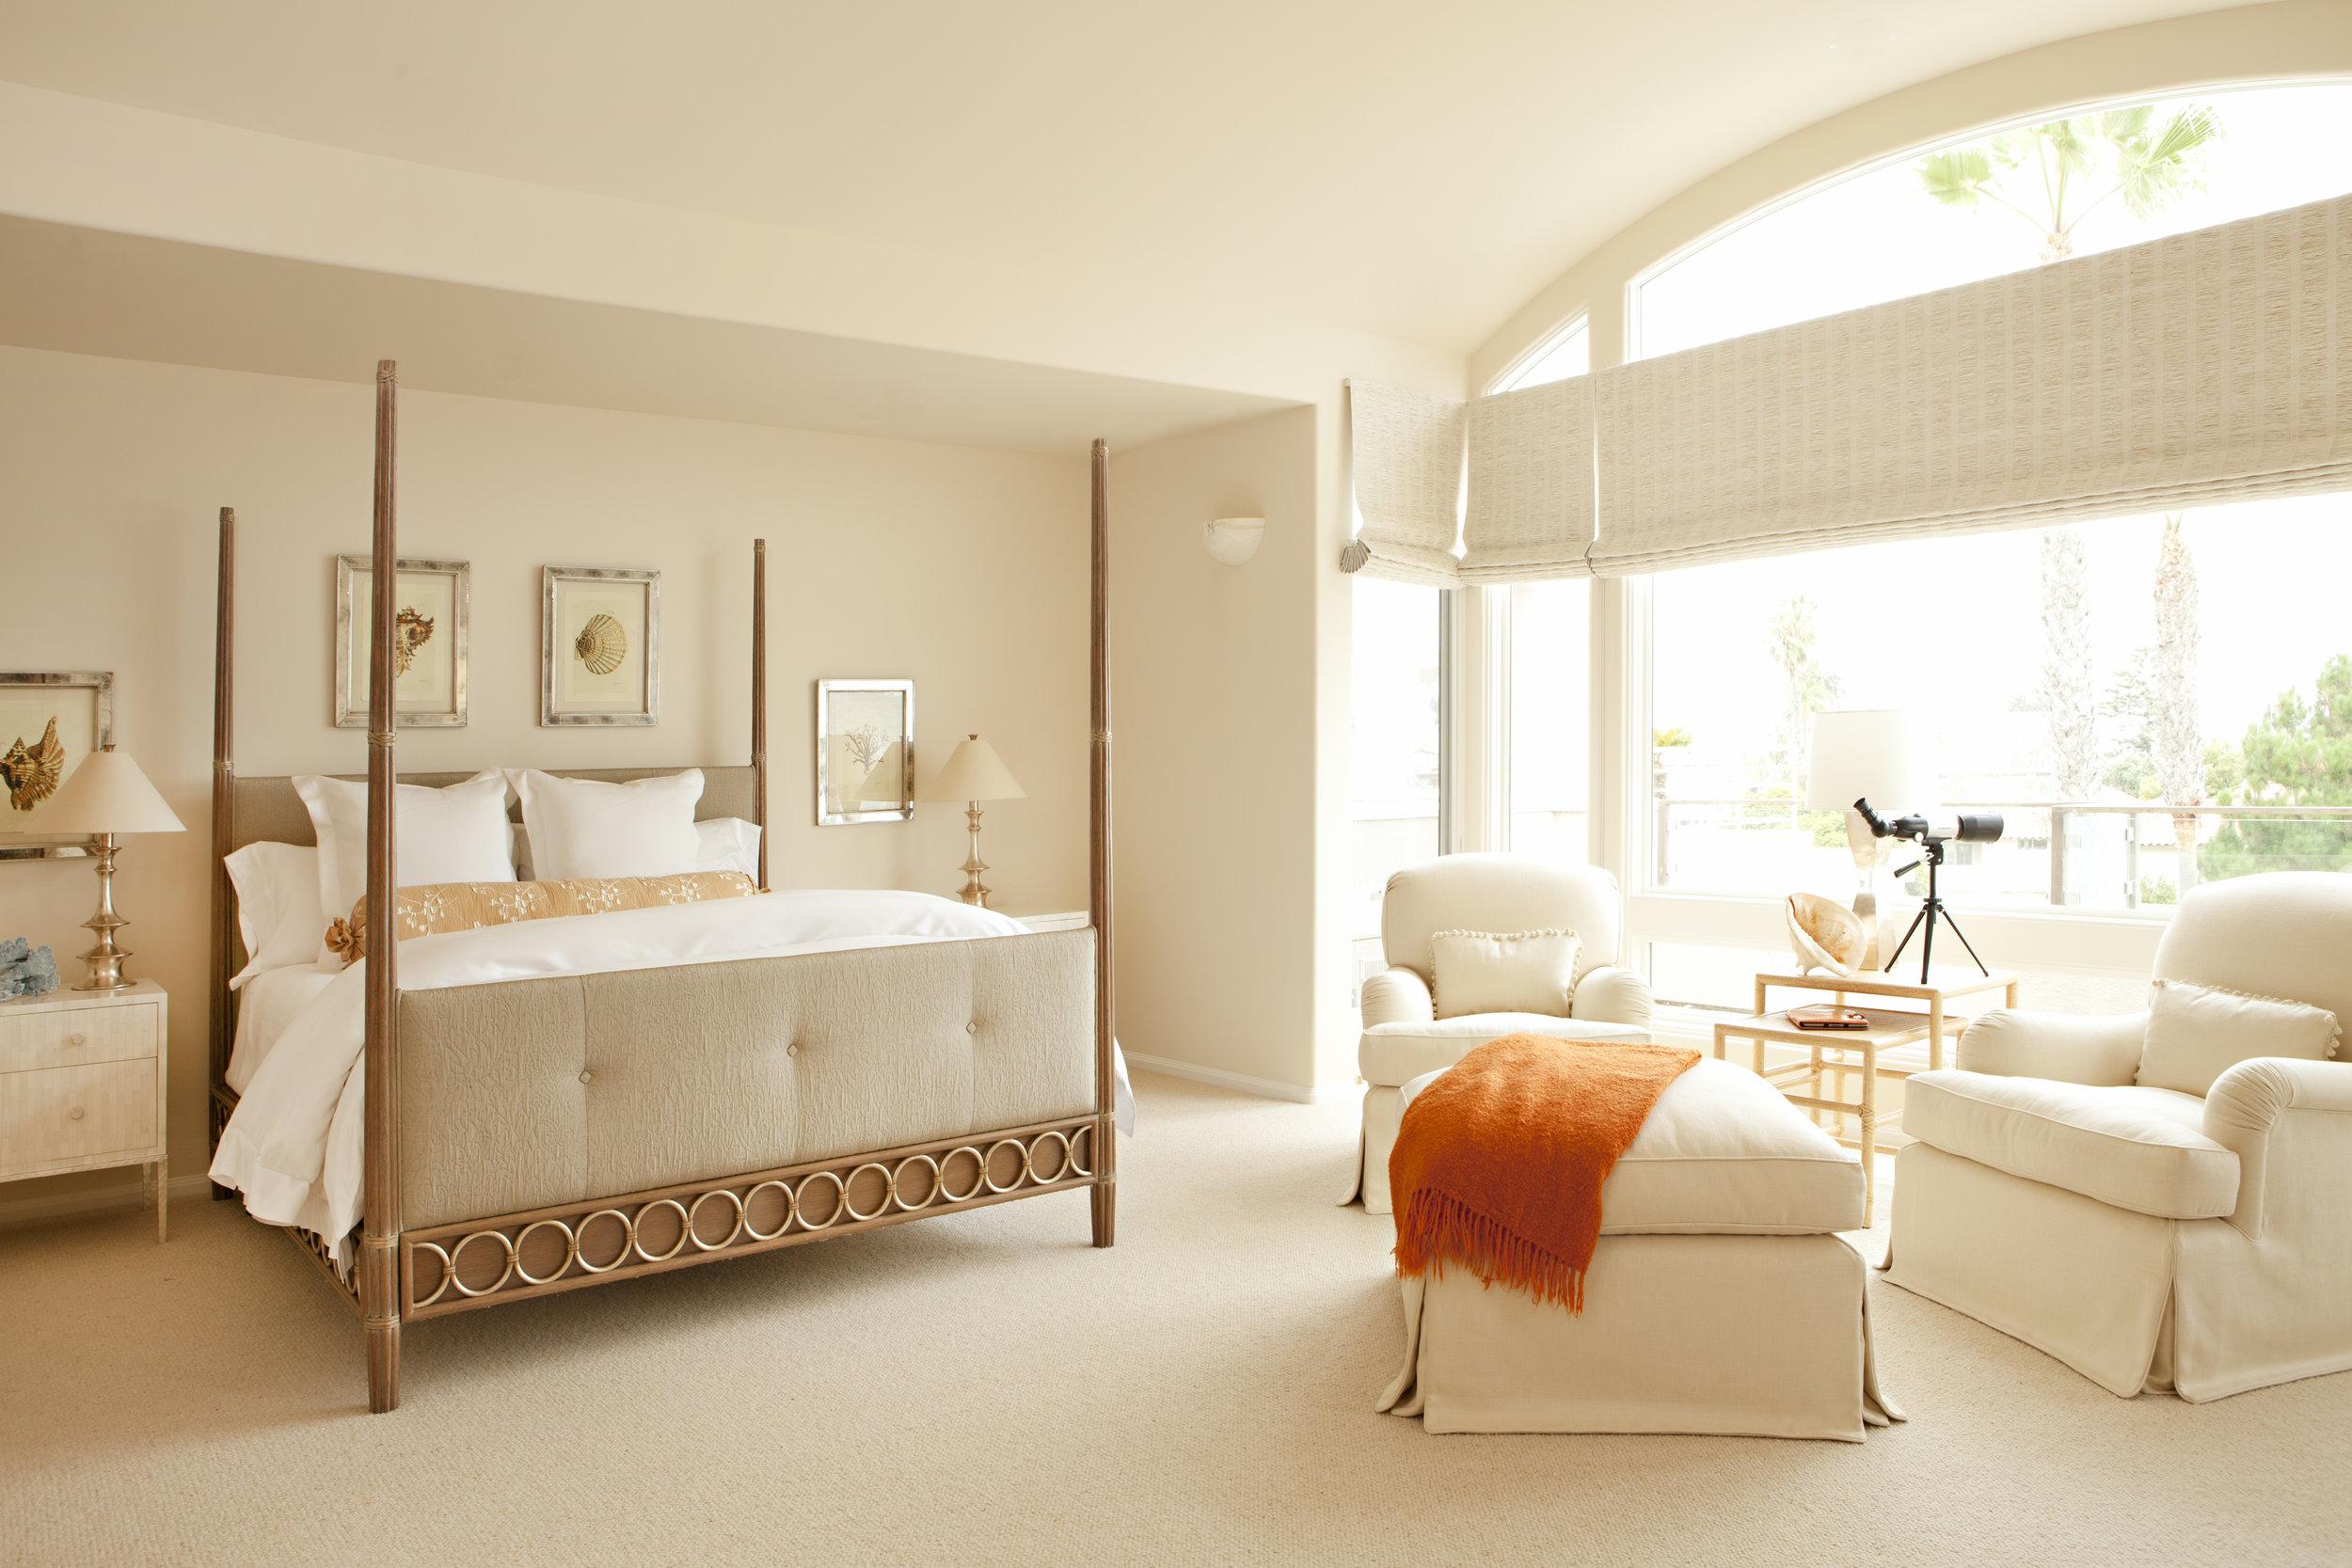 KLEIN - LA JOLLA_MASTER BEDROOM 1.jpg